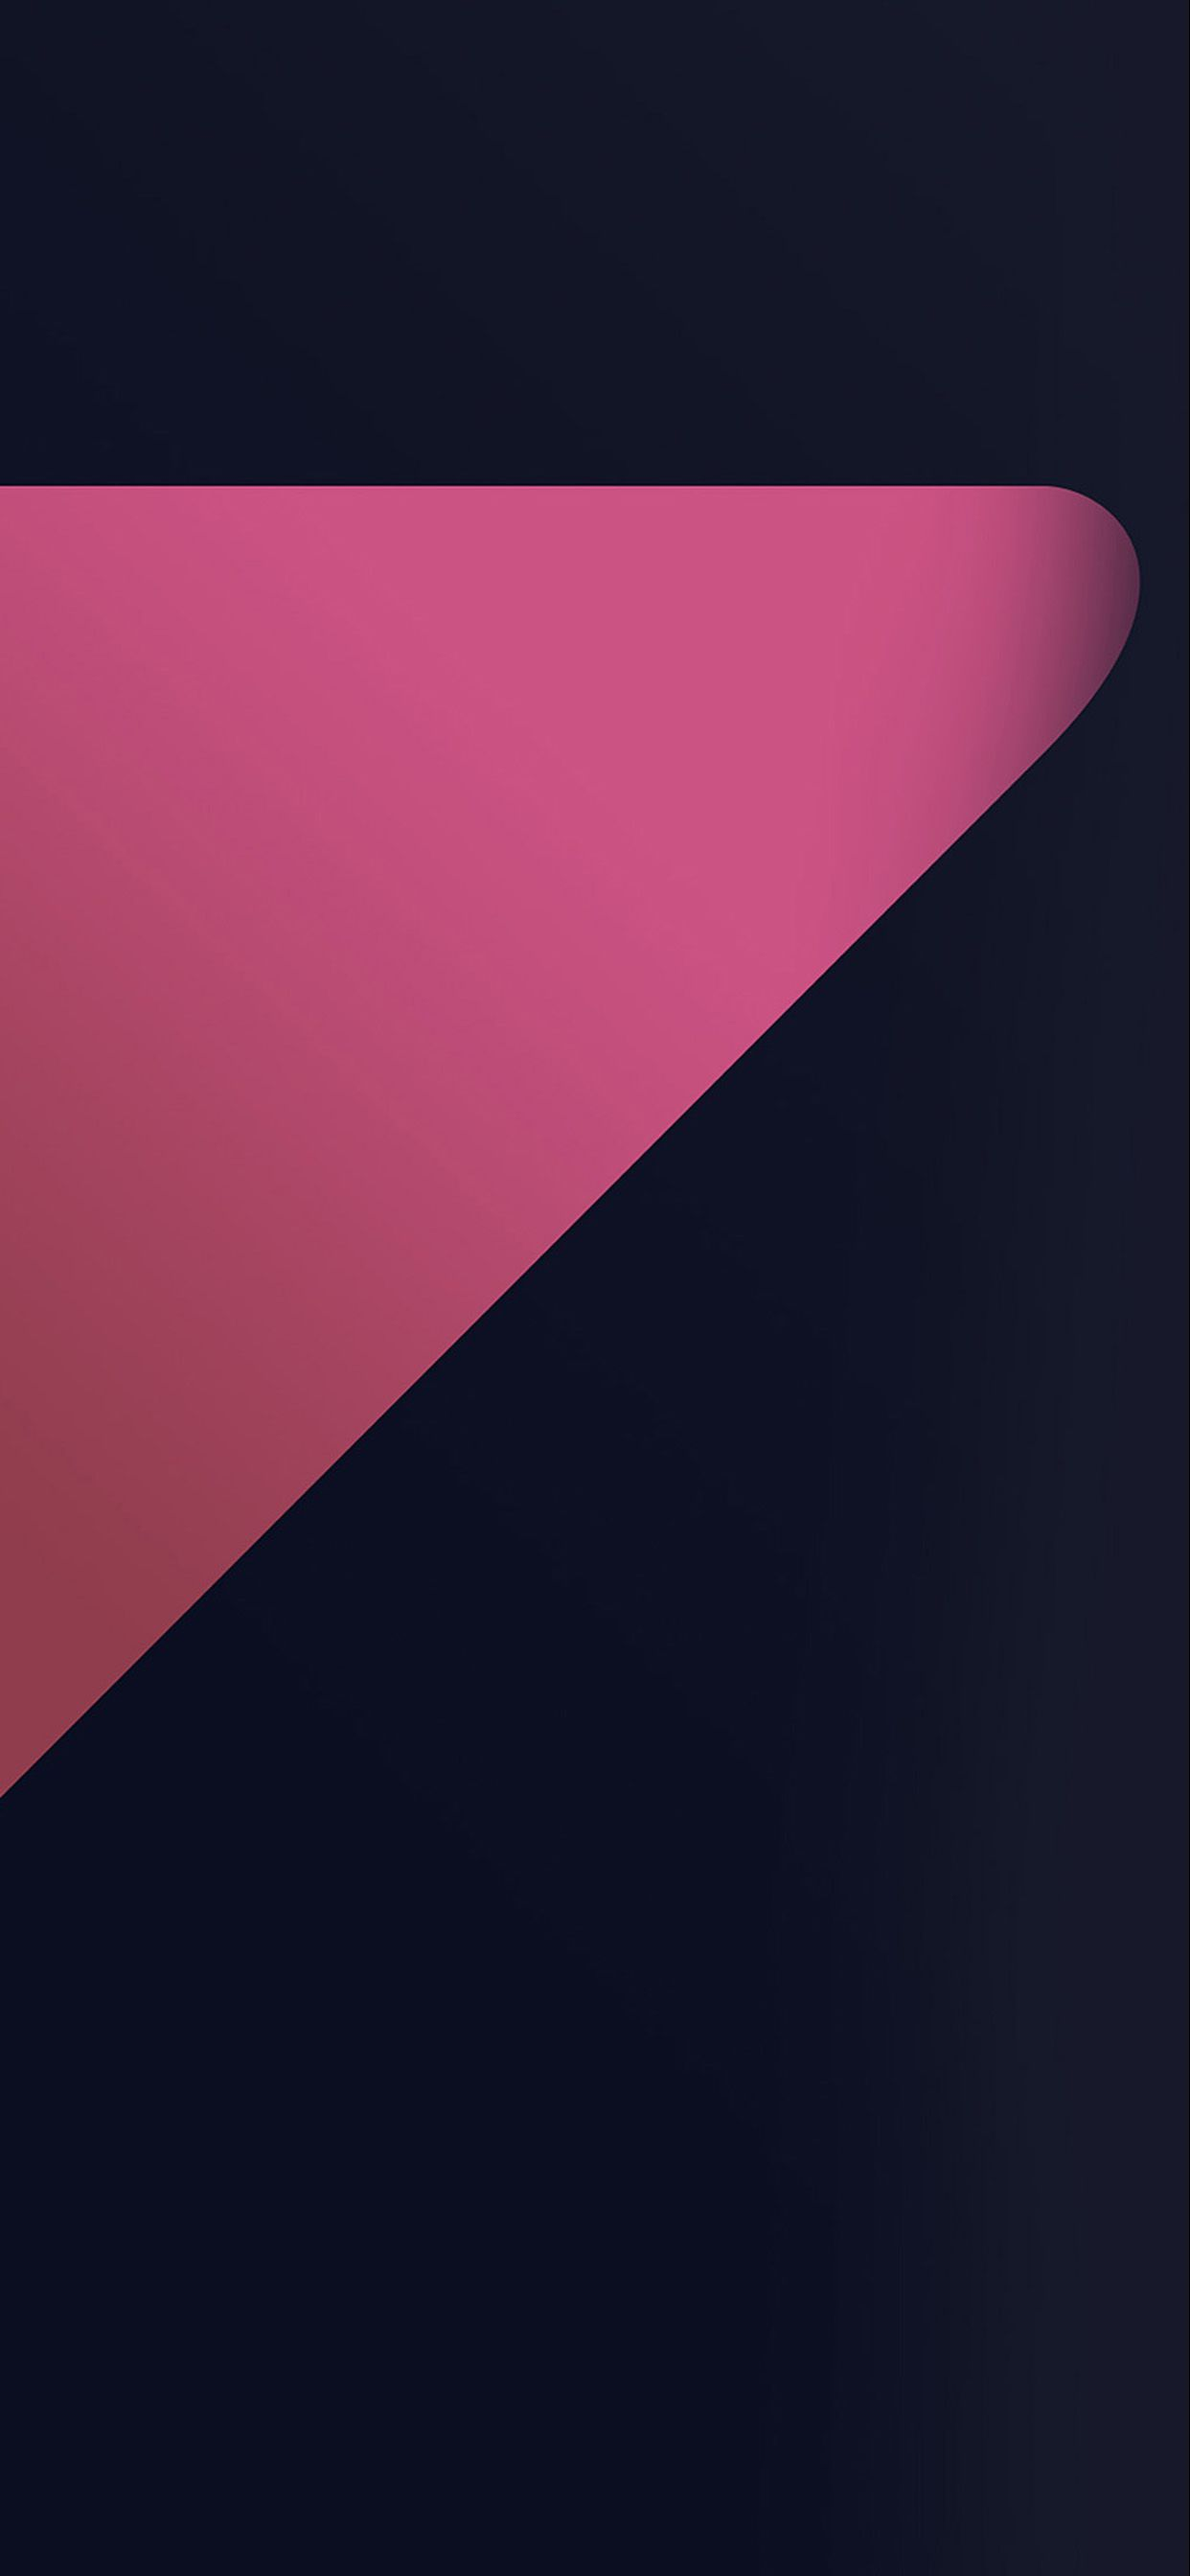 Geometric Iphone Xs Max Wallpaper Wallpapers In 2019 Wallpaper